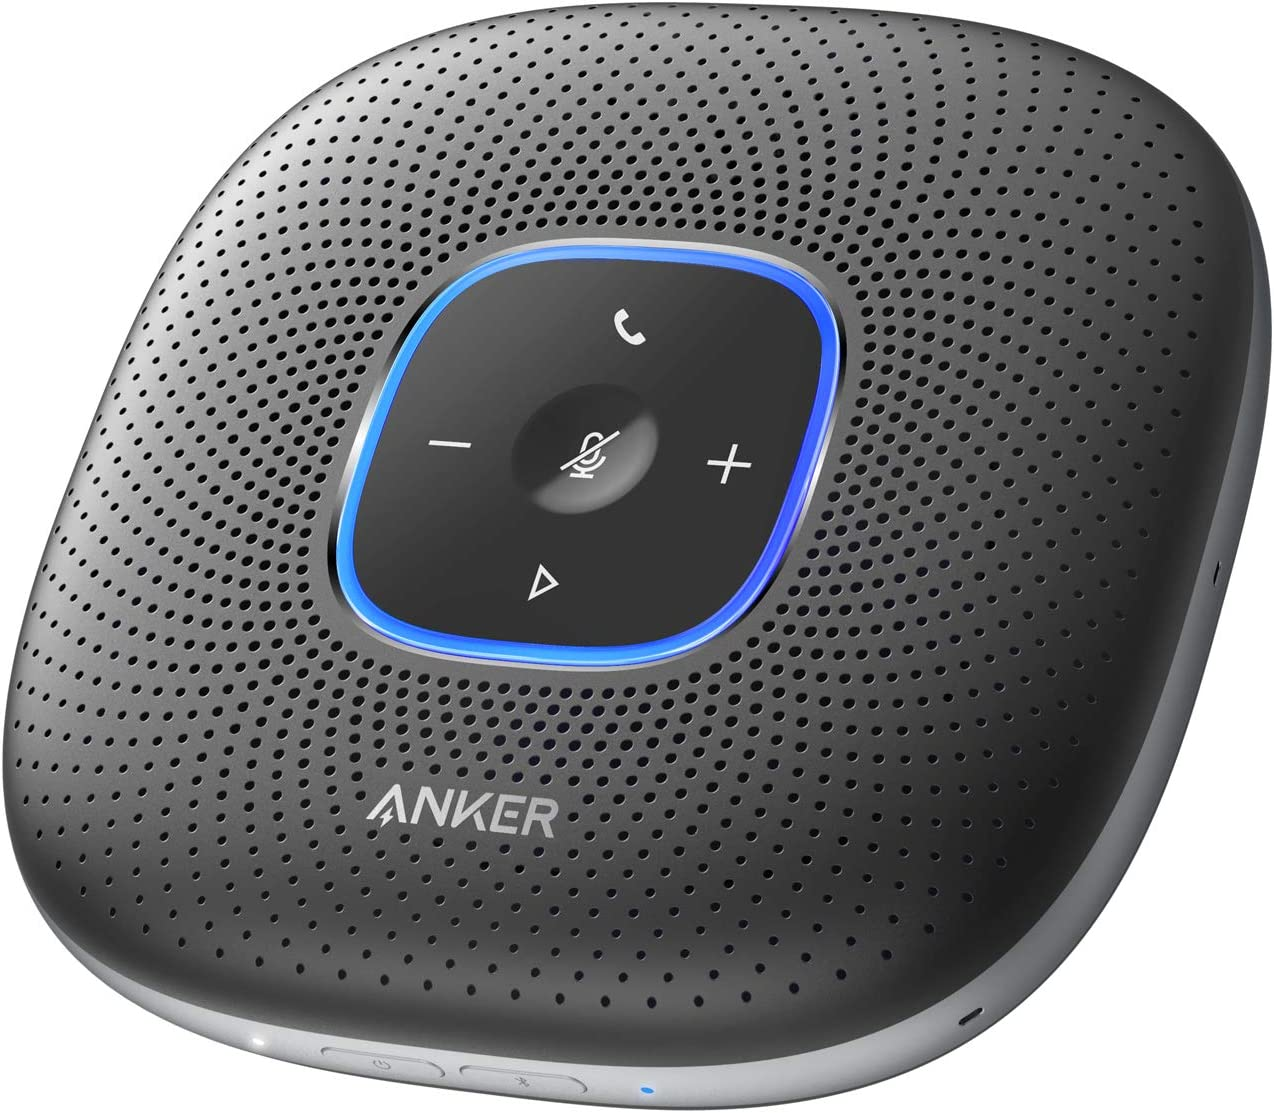 Anker PowerConf (会議用 Bluetooth スピーカーフォン)【 全指向性 マイク/オートゲインコントロール/エコーキャンセリング/ノイズリダクション/モバイルバッテリー機能/Skype Zoom など対応 / 24時間連続使用 / USB-C接続/ビデオ会議/PowerIQ 対応】